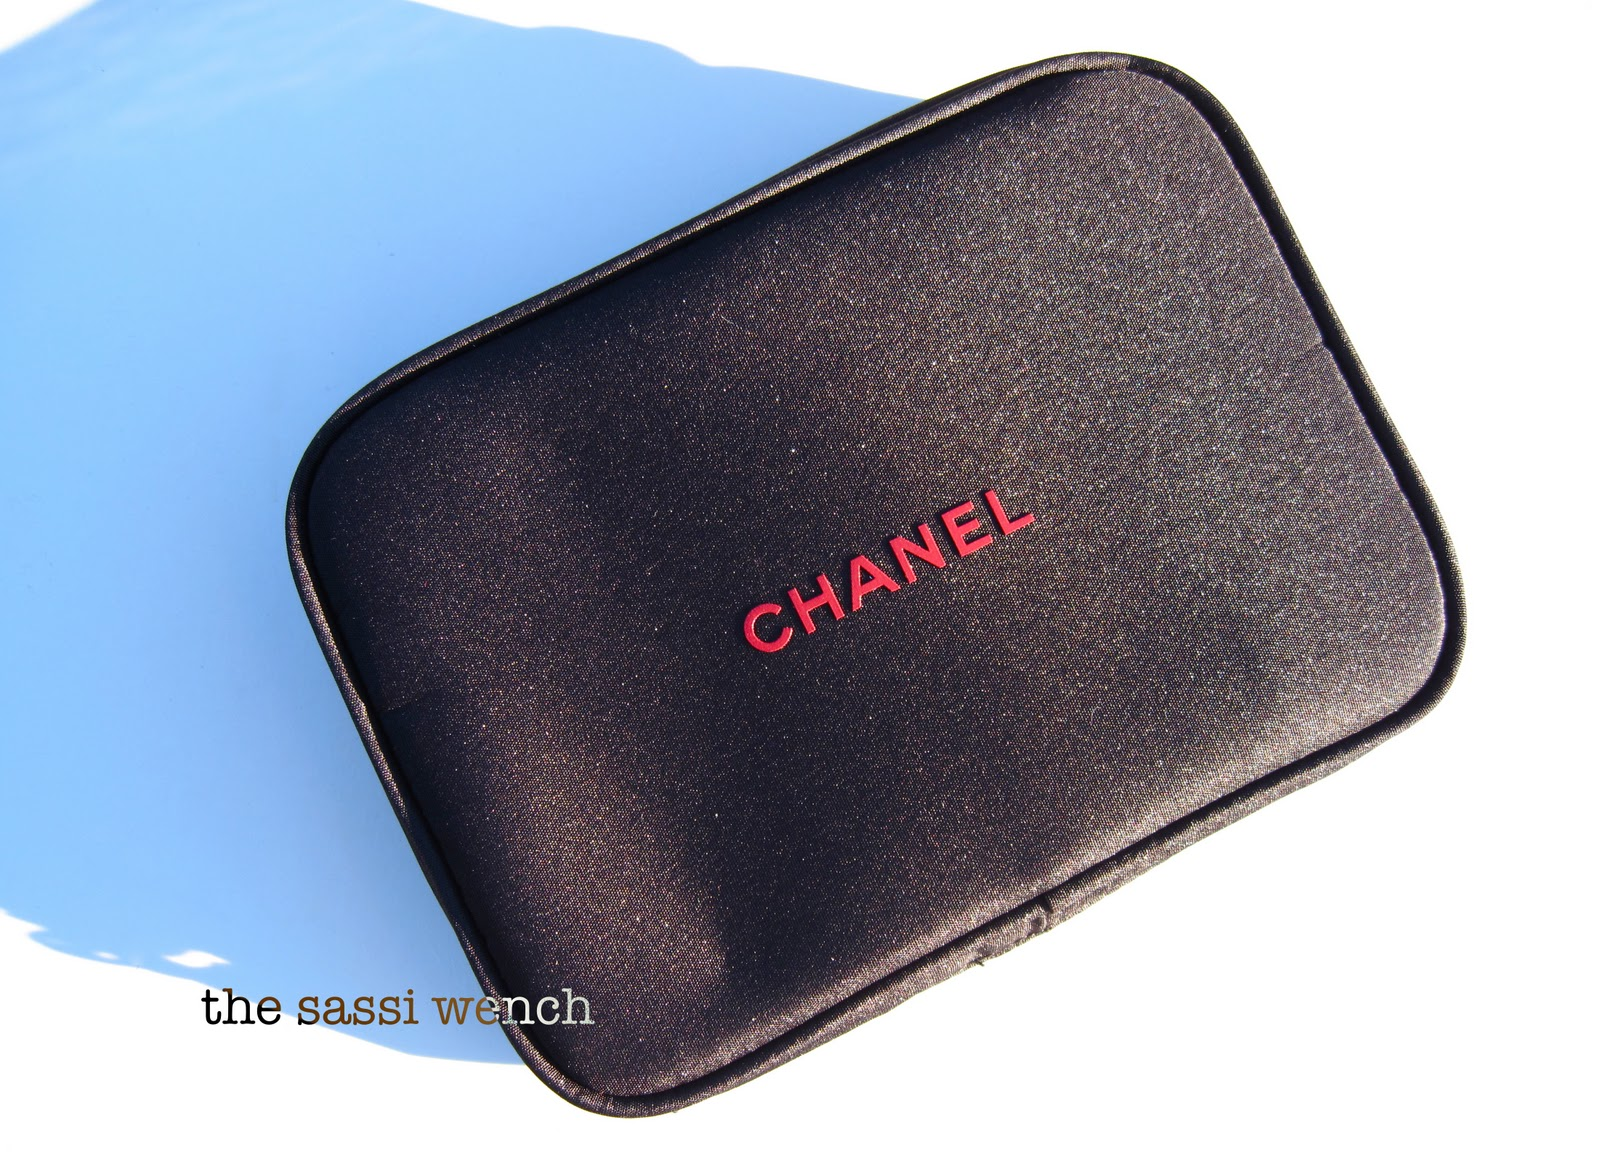 ... lived it...: Chanel Holiday 2011 Makeup Brush Set Les Minis de Chanel